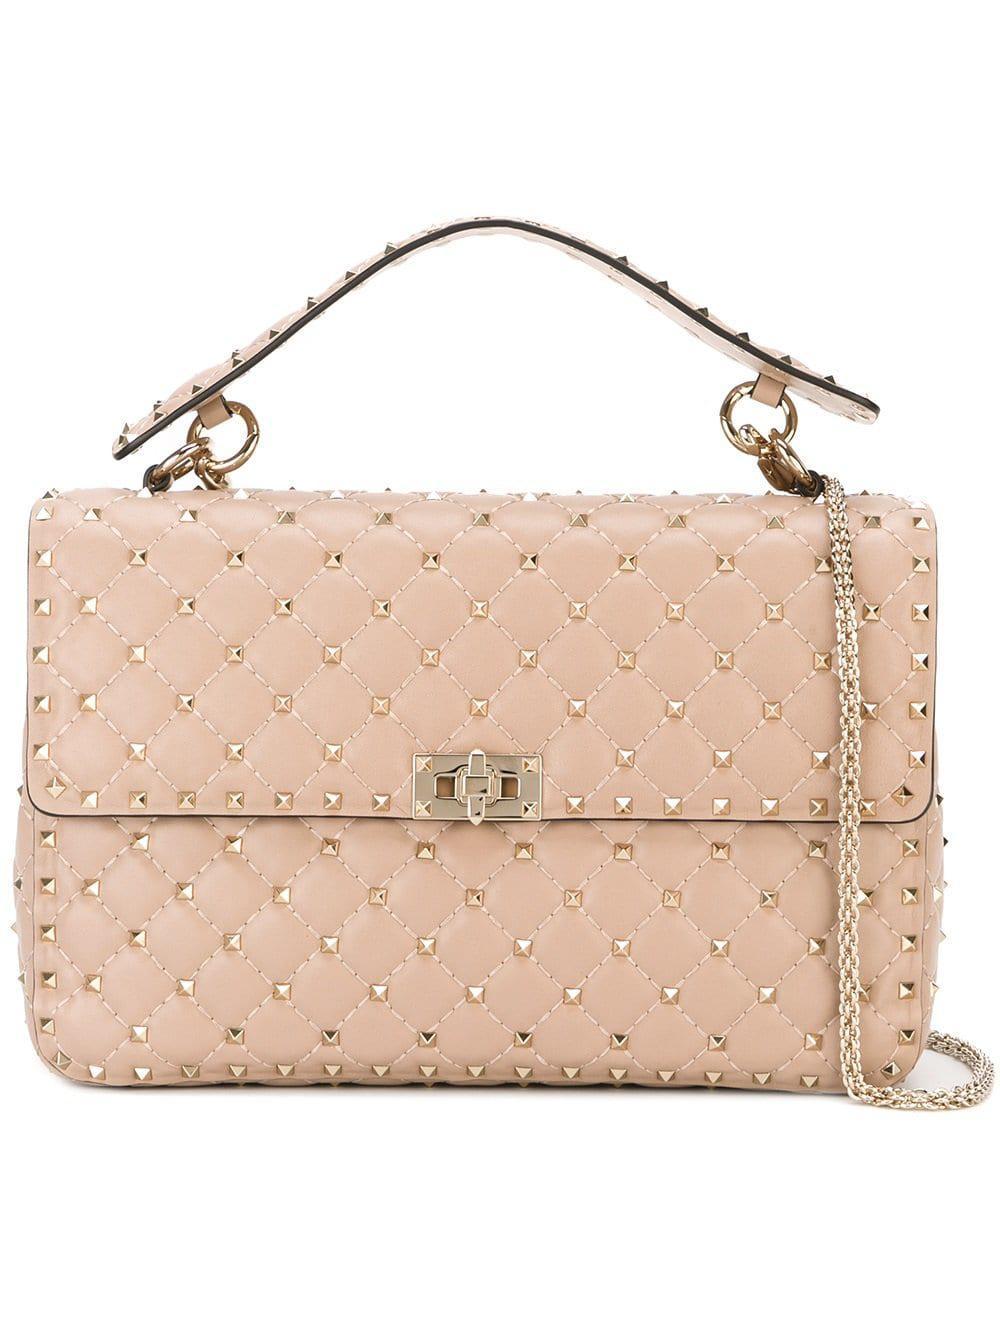 96fd8a54428f Lyst - Valentino Rockstud Spike Large Leather Shoulder Bag in Pink